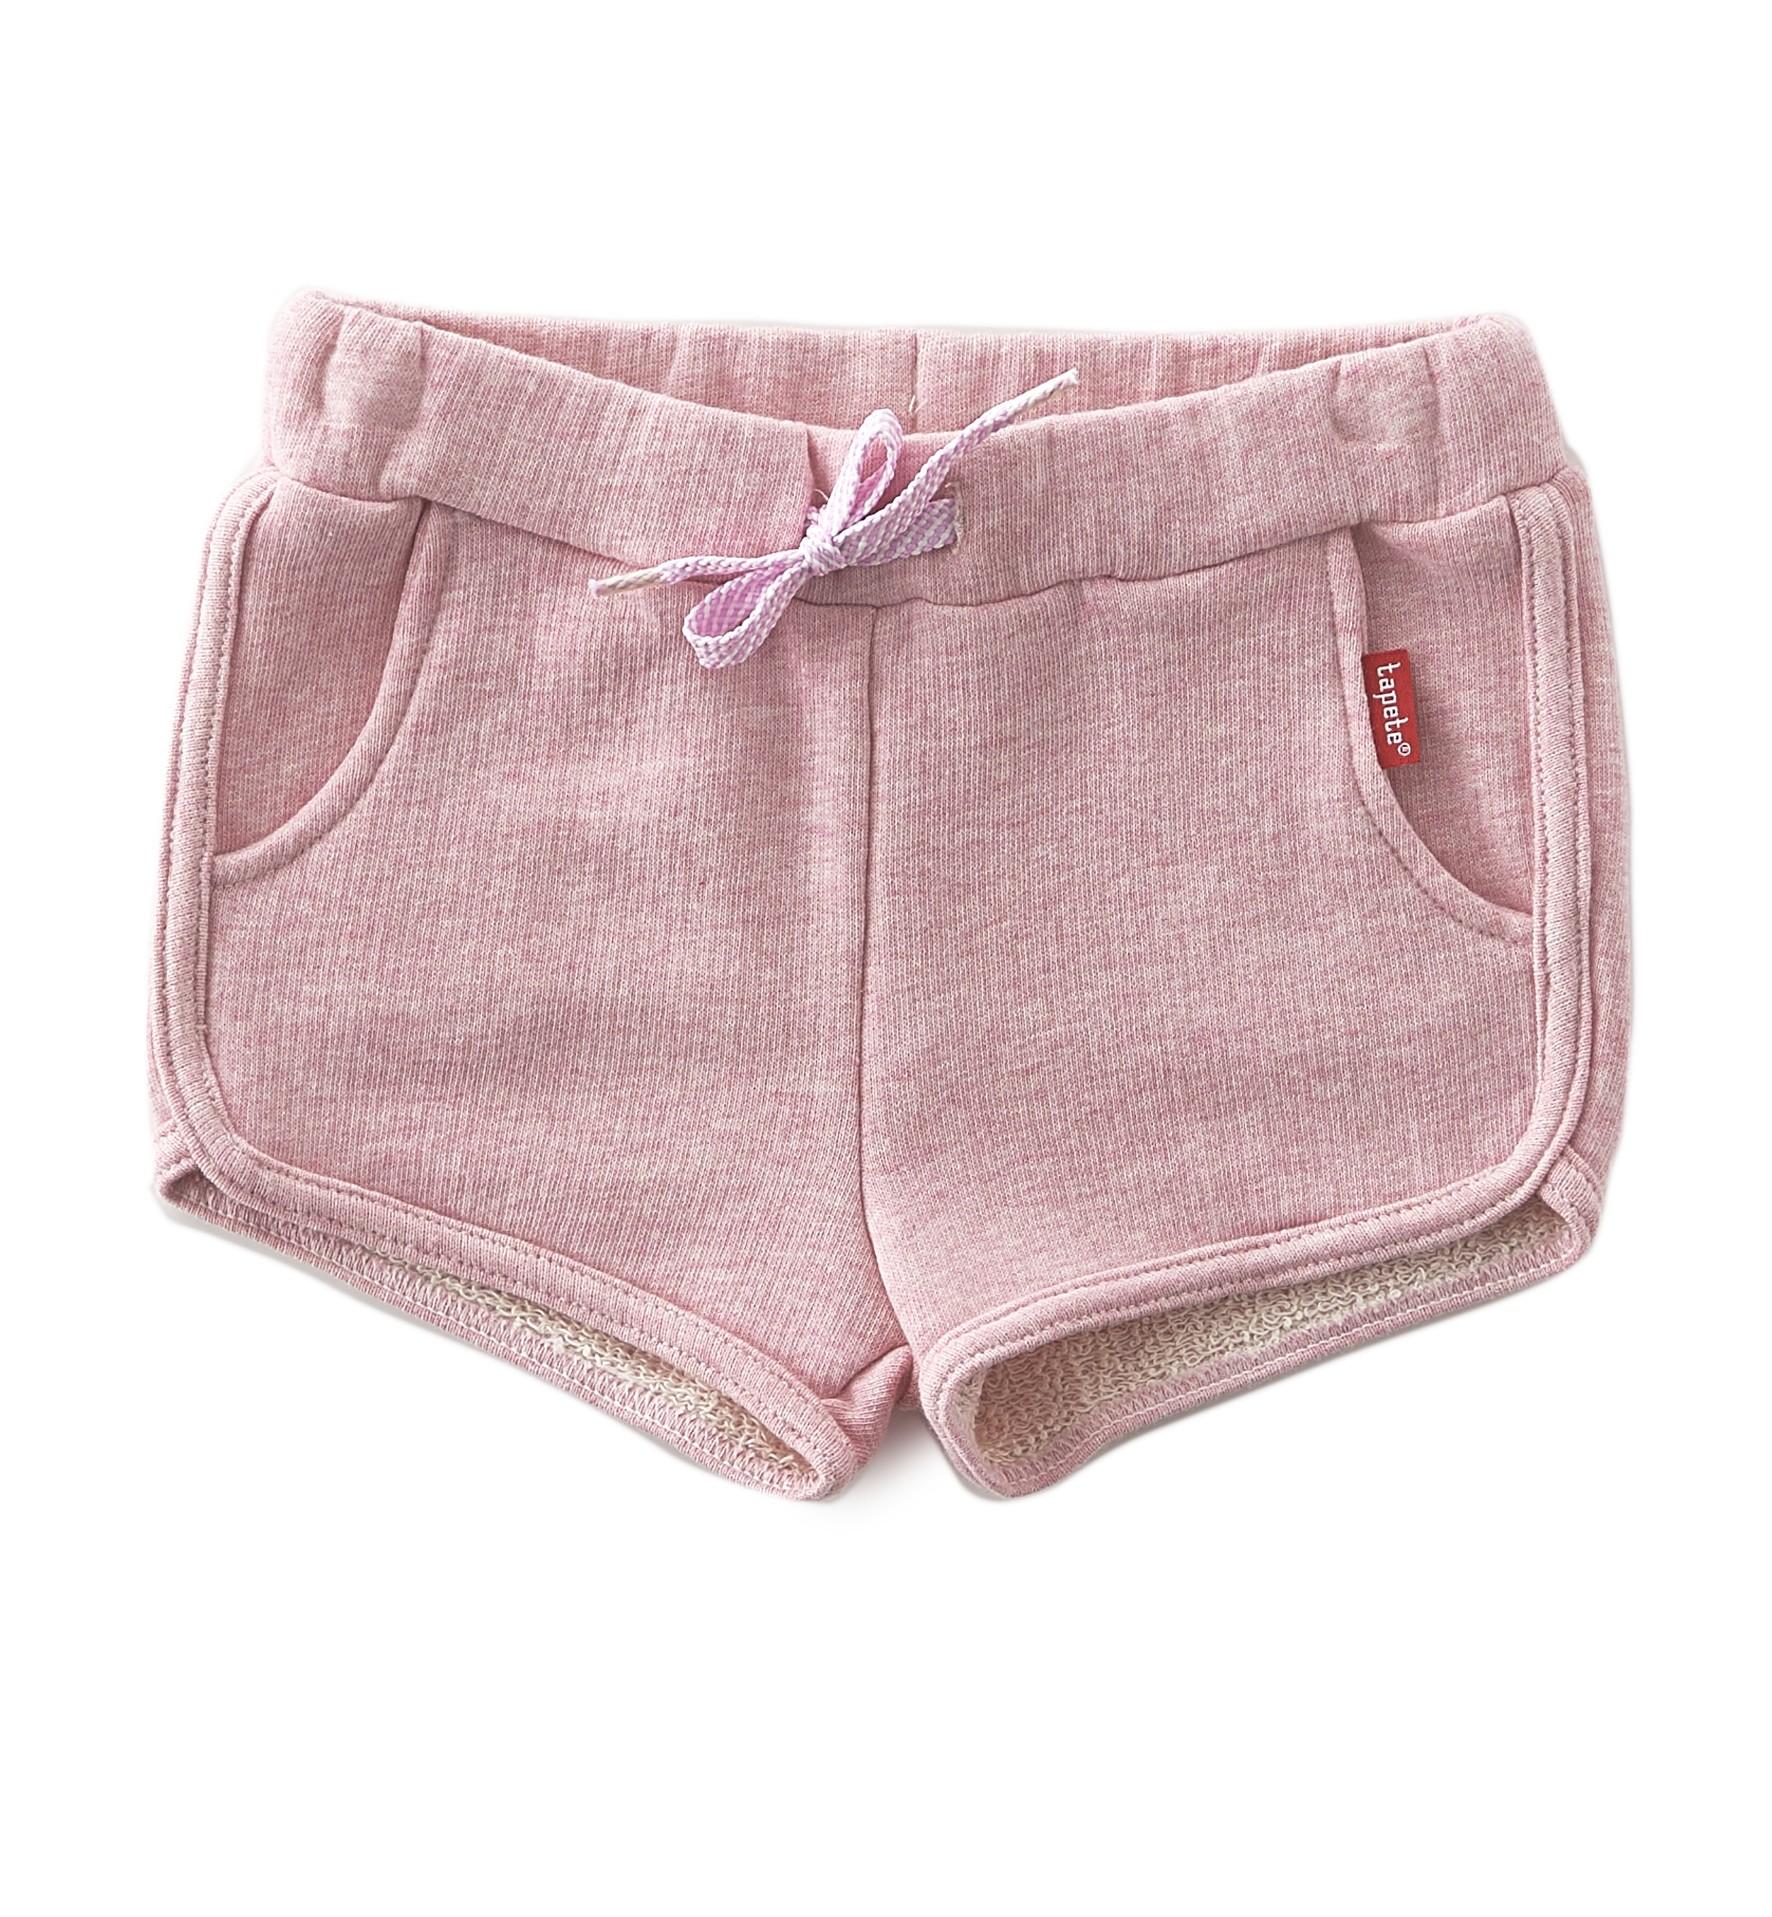 Kinderkleding En Babykleding Van Sweat Shorts Mädchen Rosa Tapete